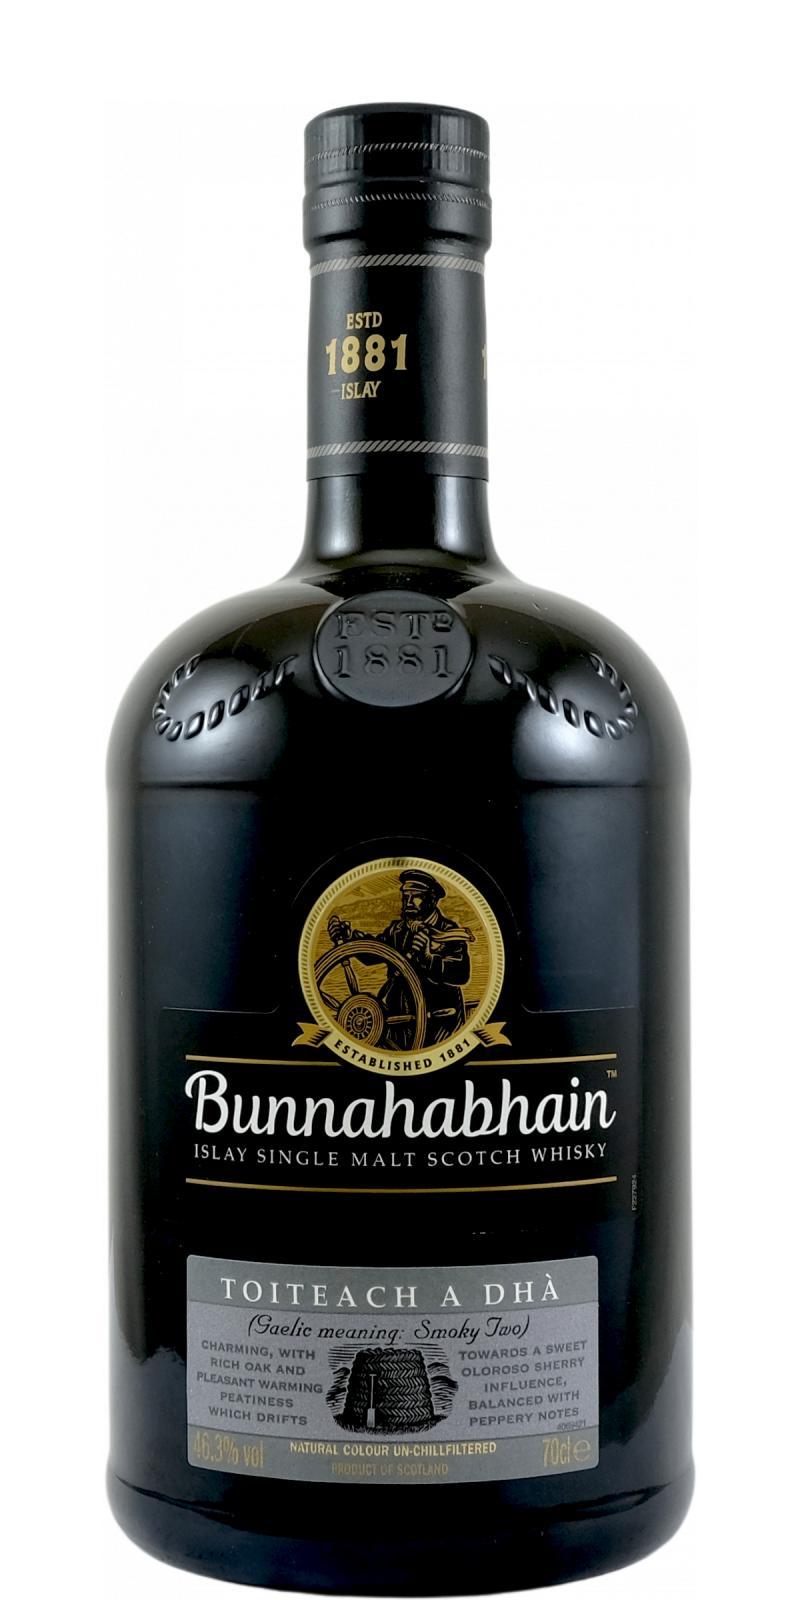 Bunnahabhain Toiteach a Dhà